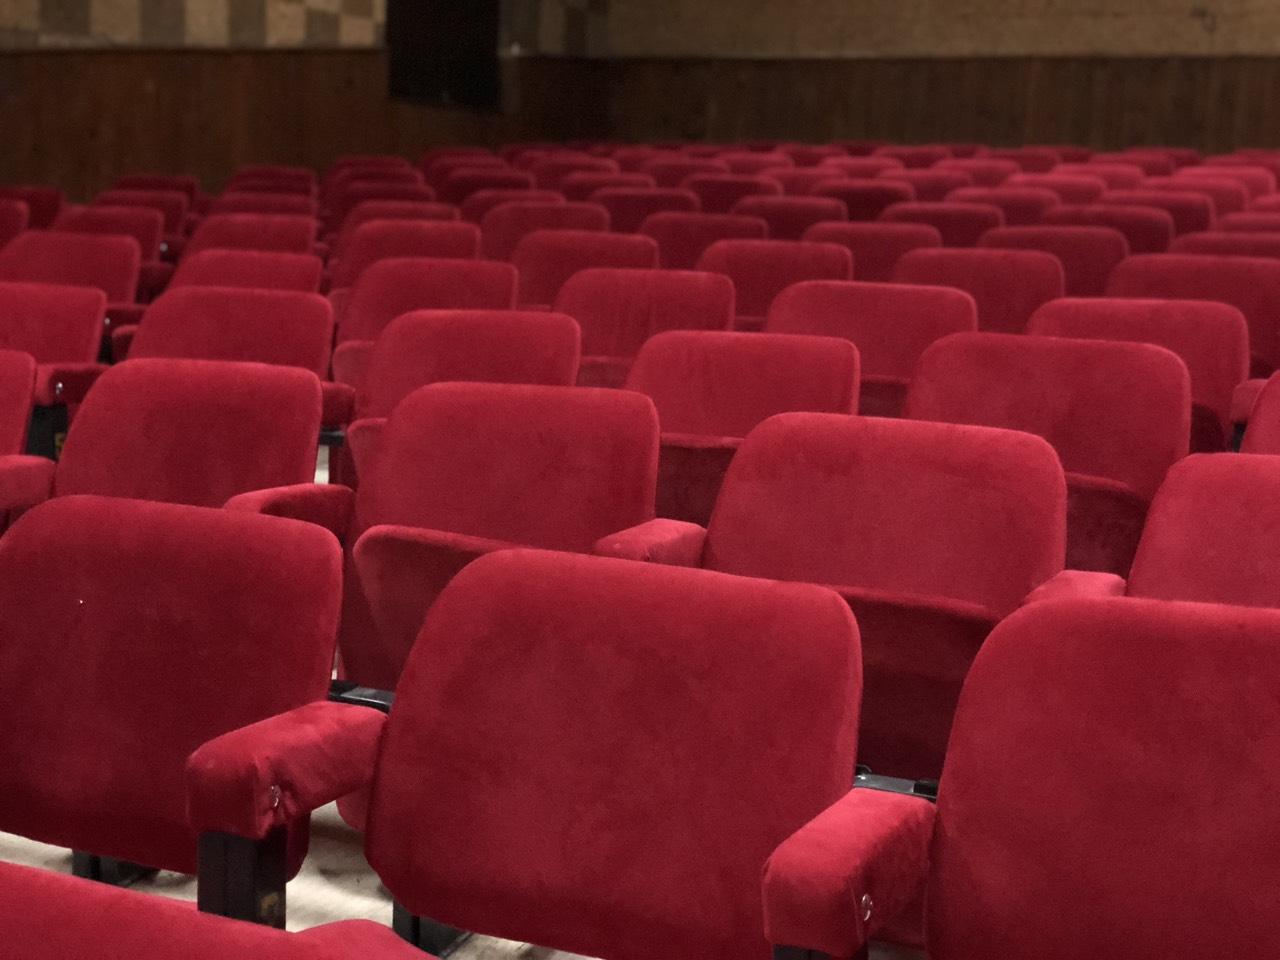 Svrljiški bioskop dobio nova sedišta